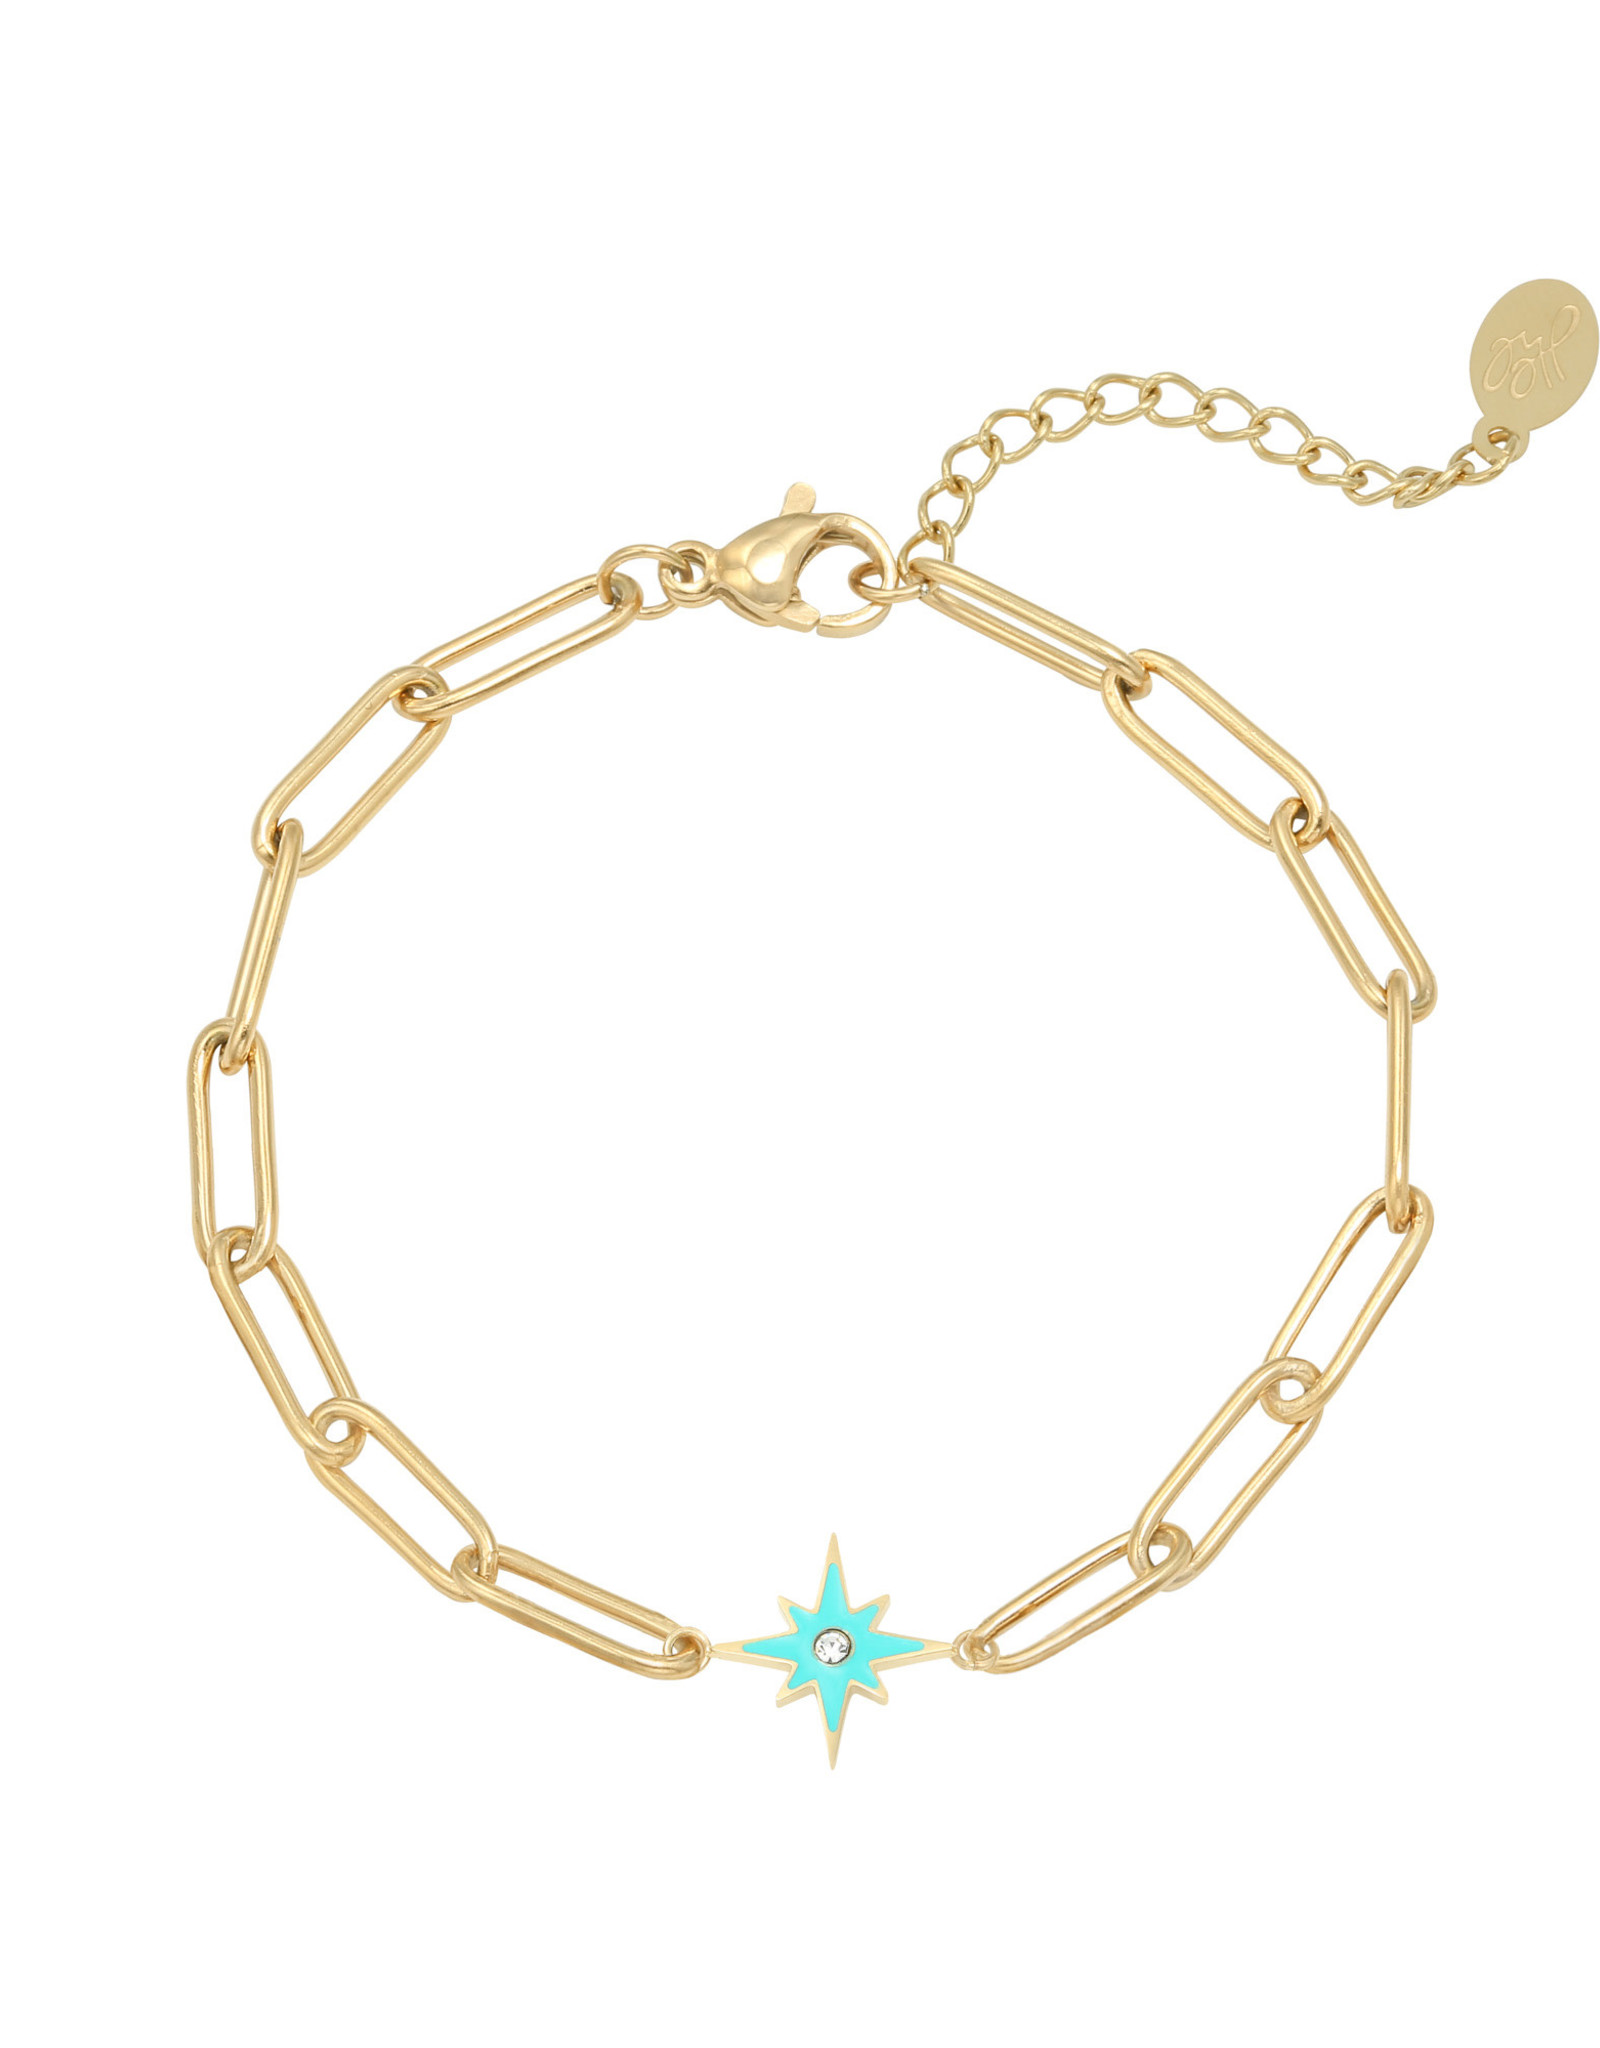 Bracelet shining star blue